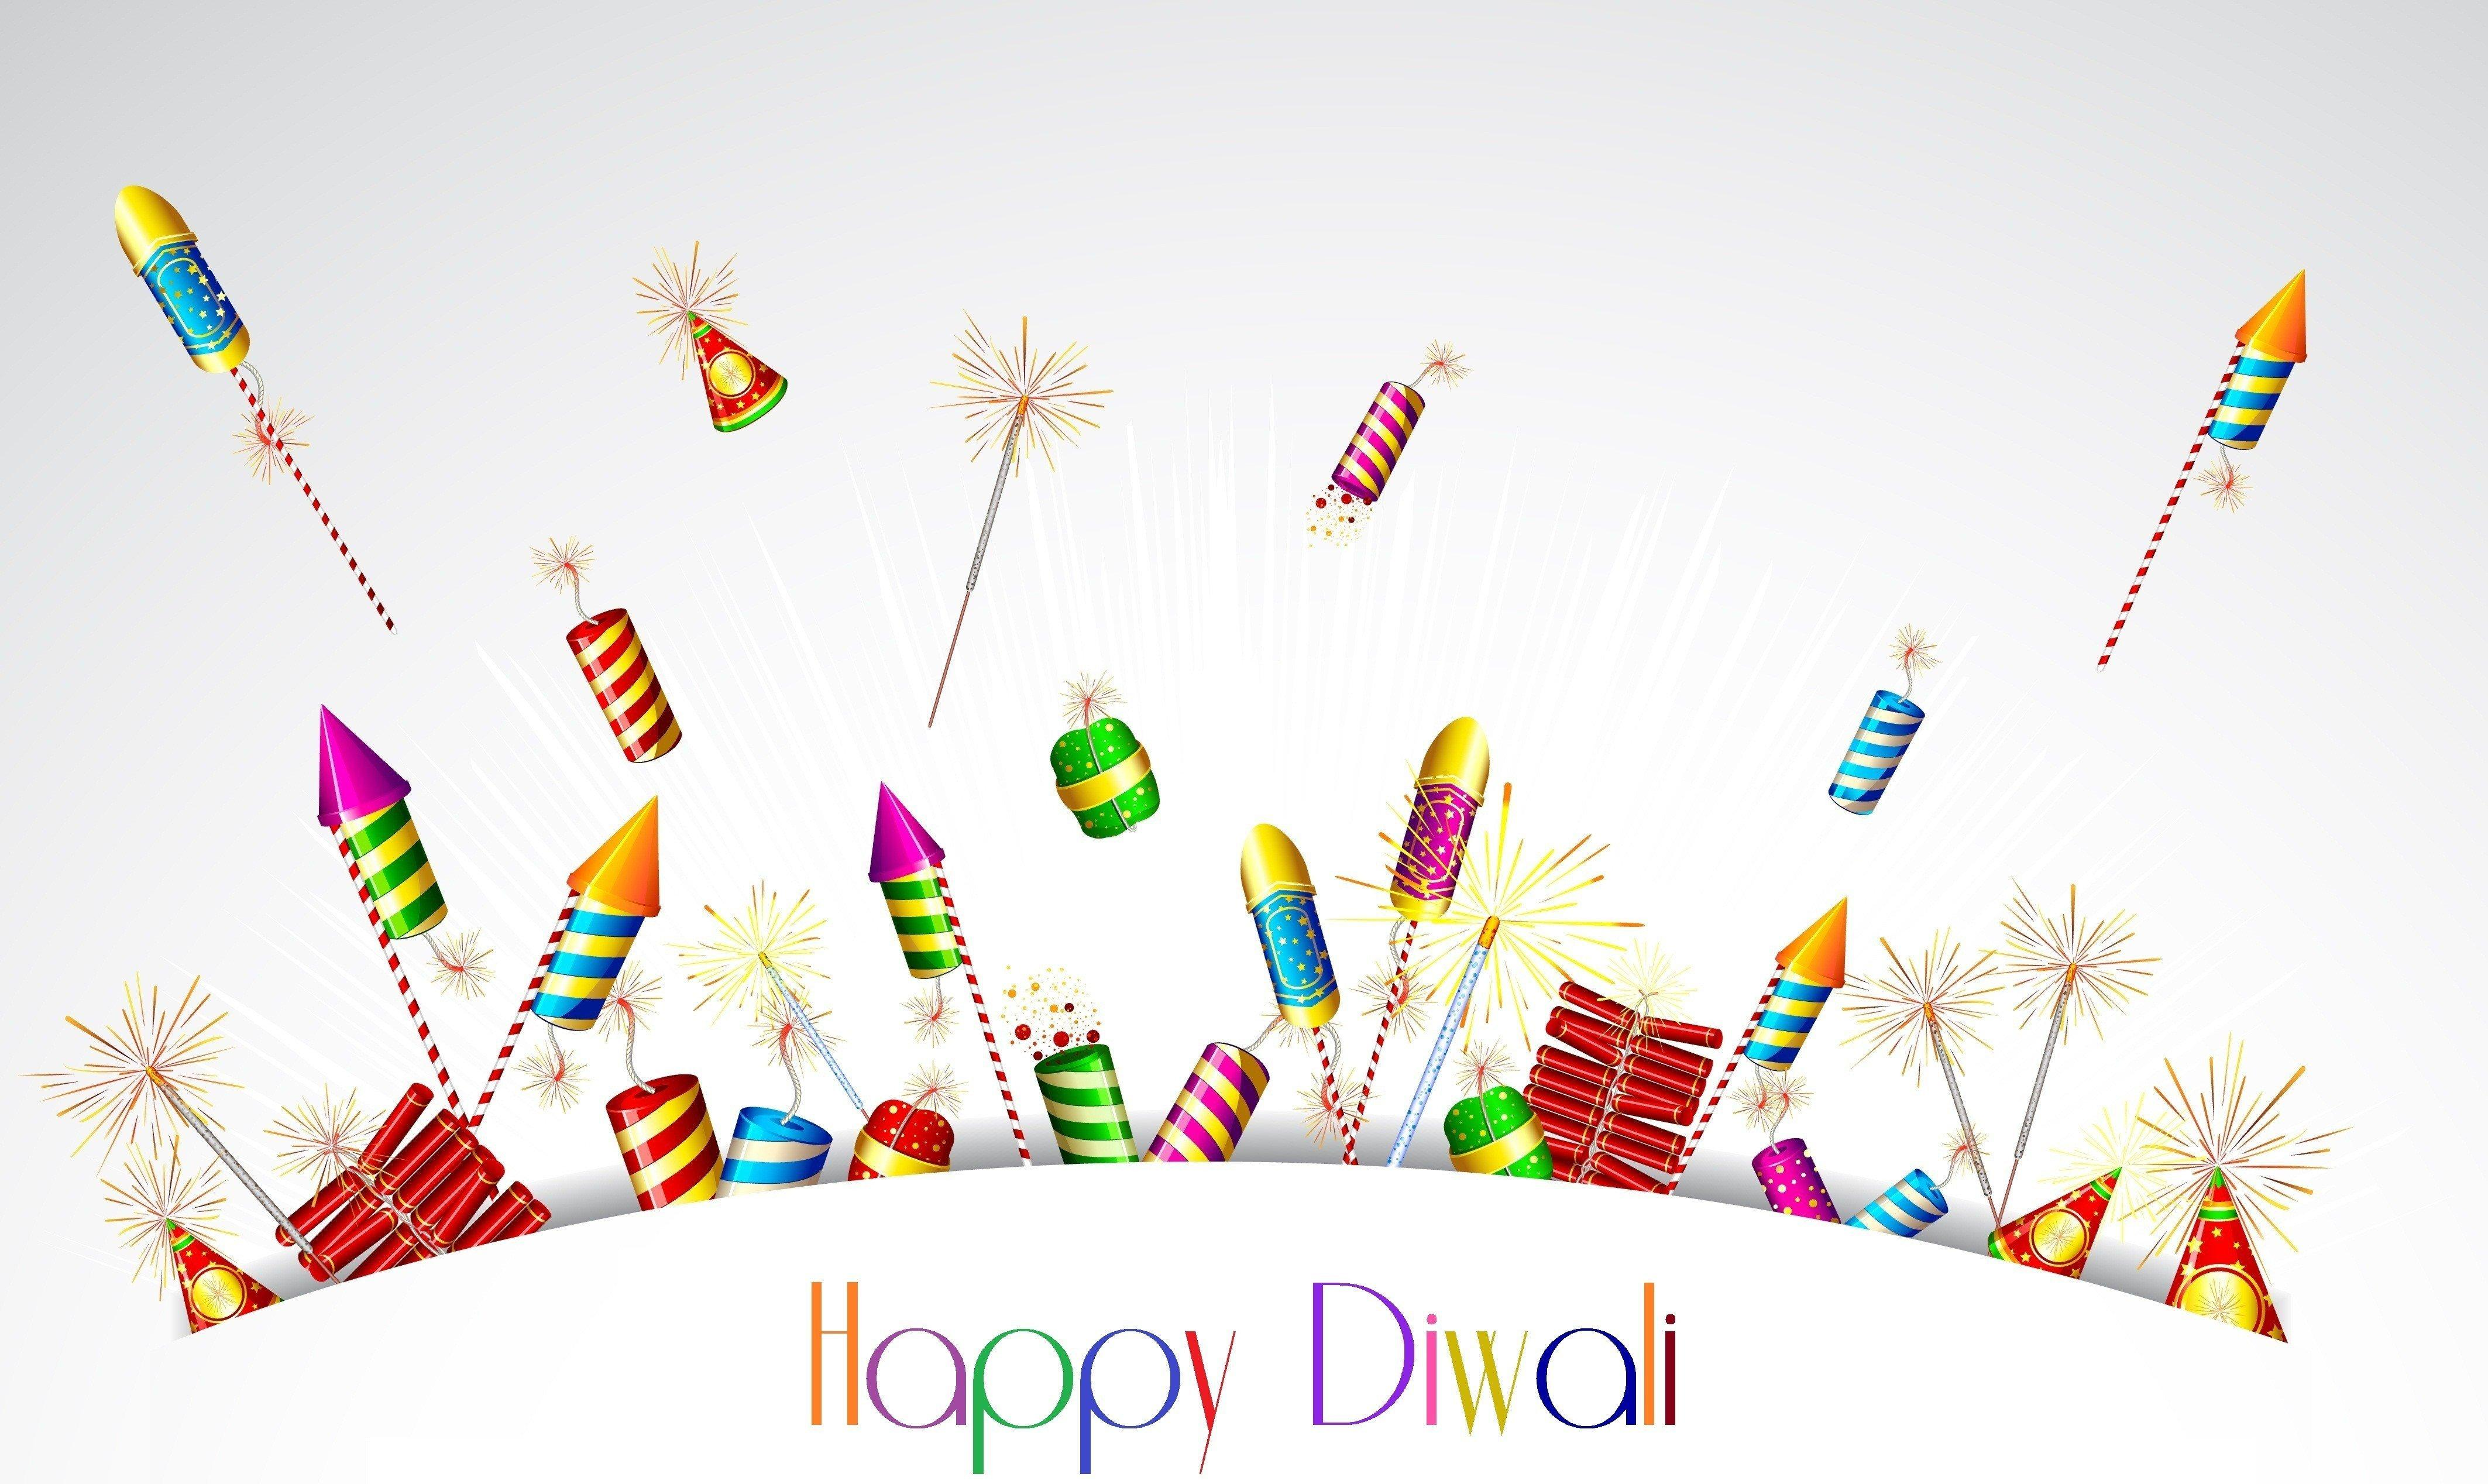 Original - Happy Diwali 2018 Wishes , HD Wallpaper & Backgrounds